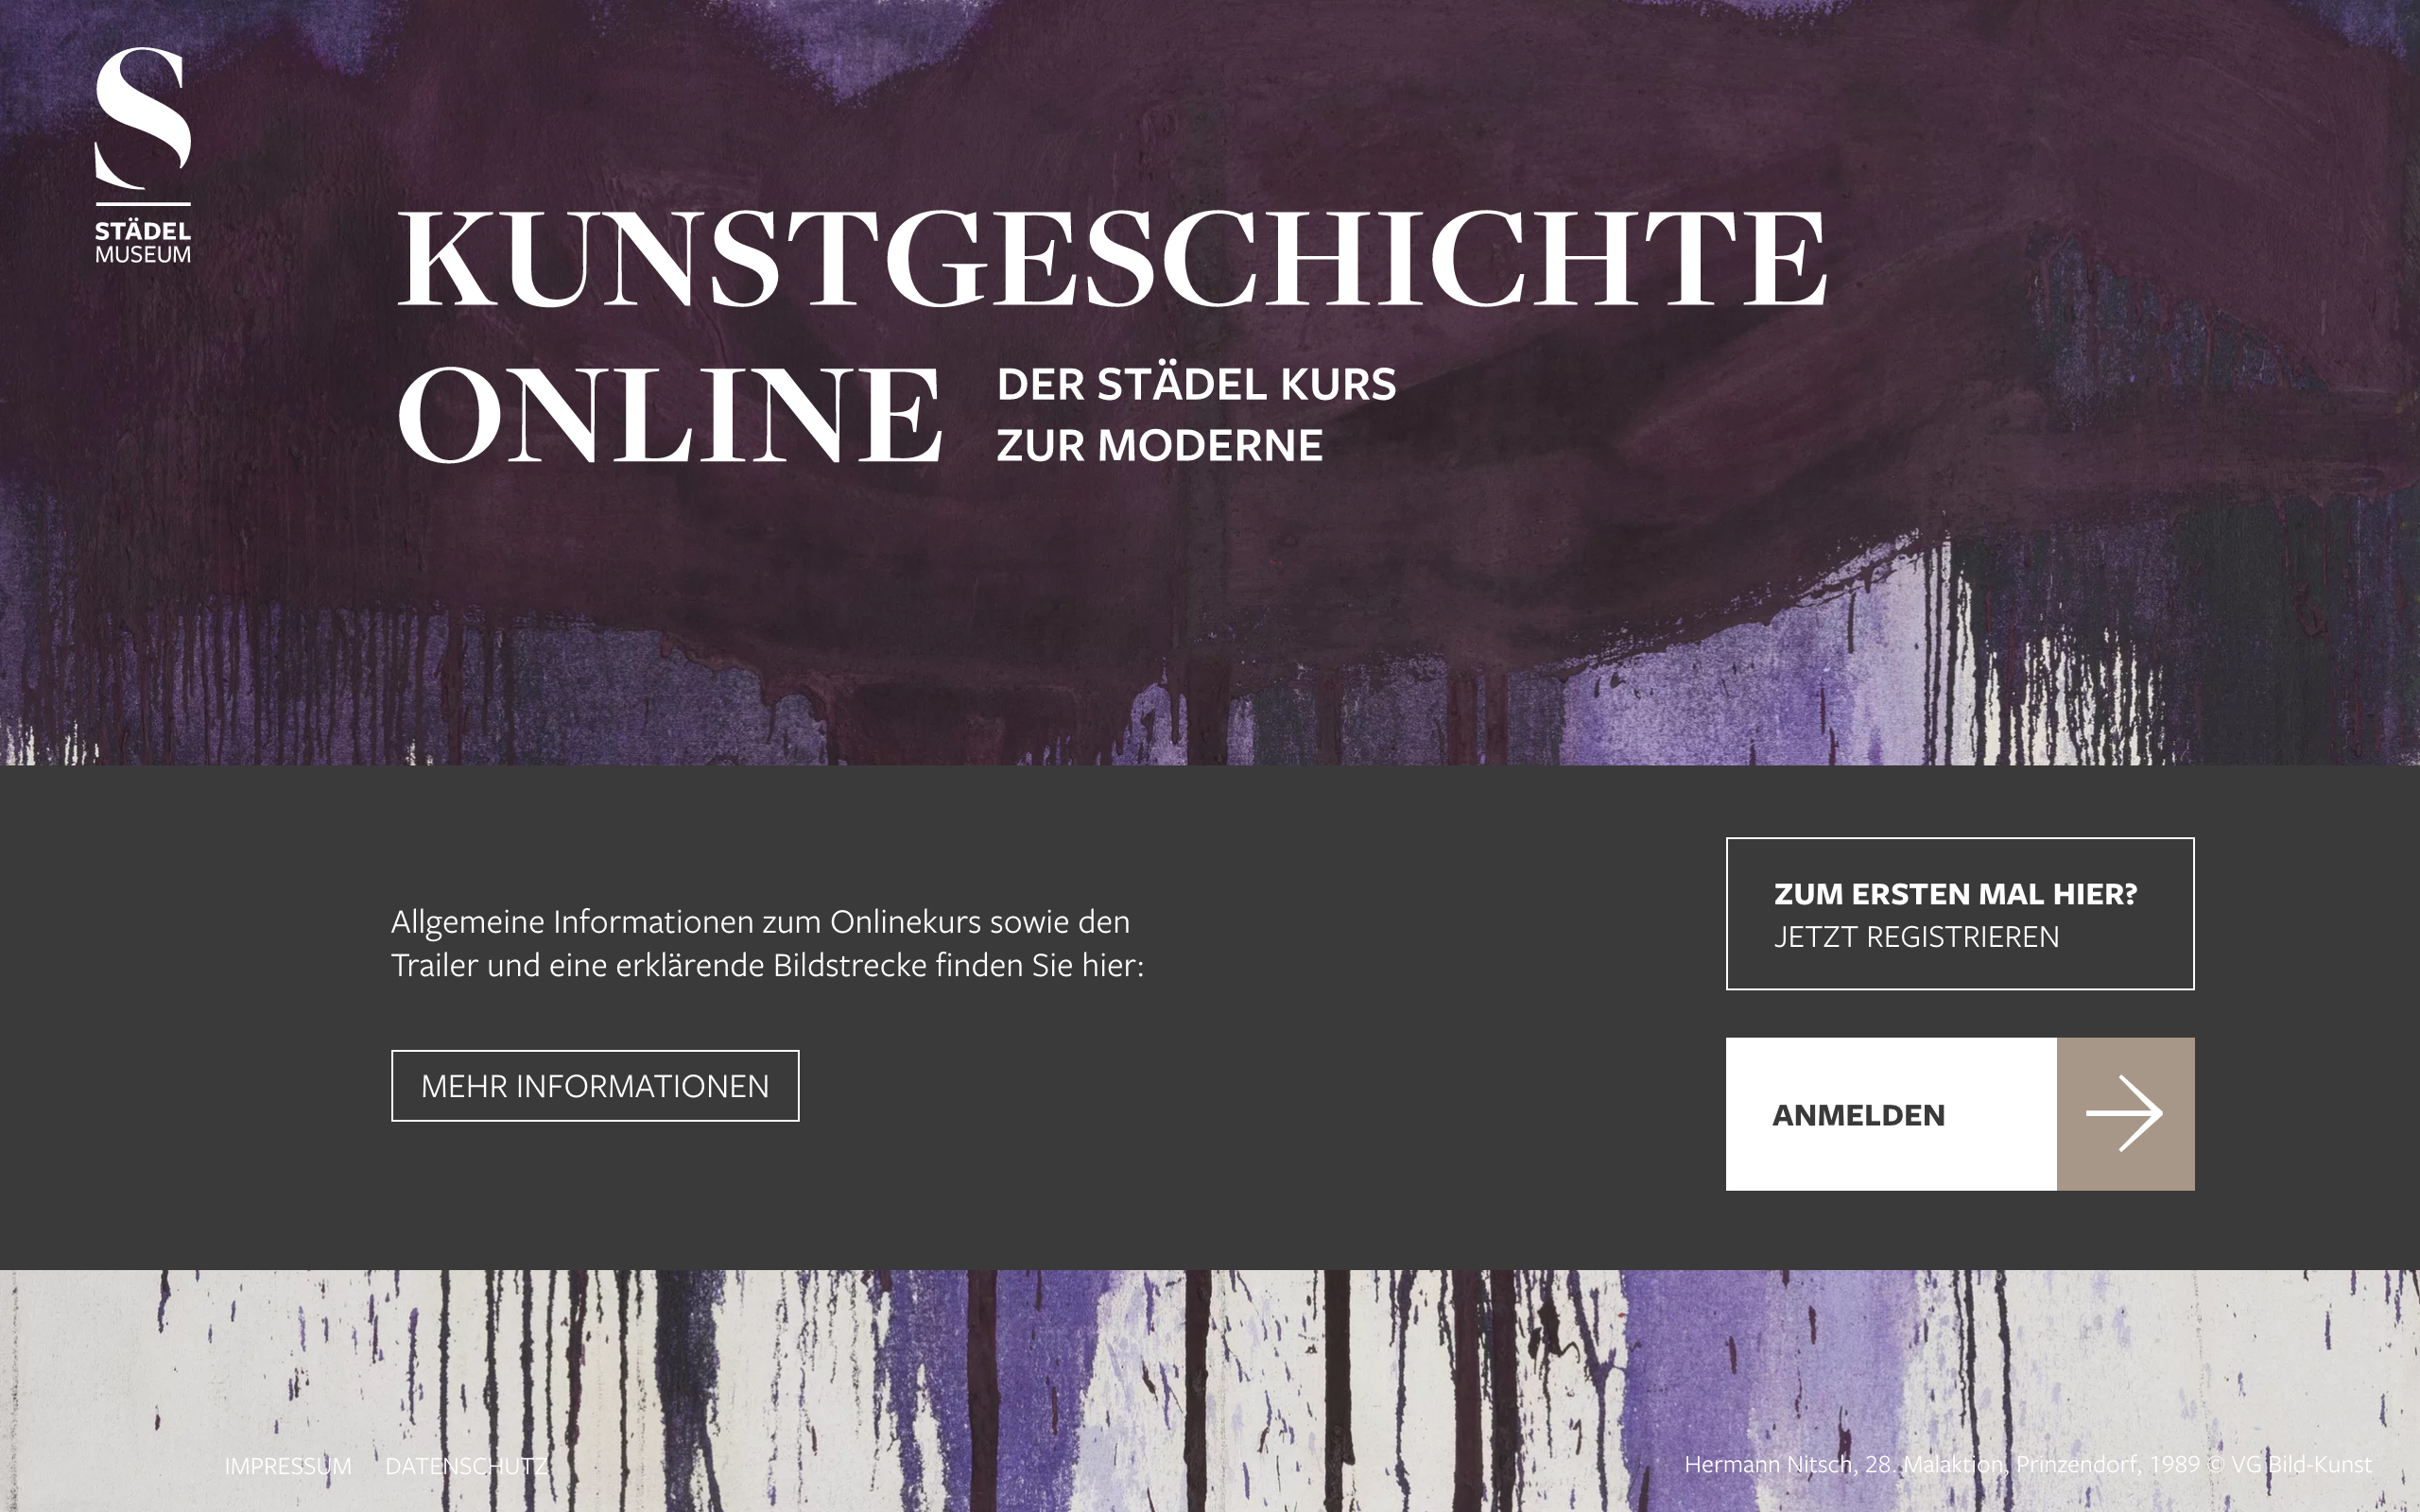 Onlinekurs Login, Foto: Städel Museum